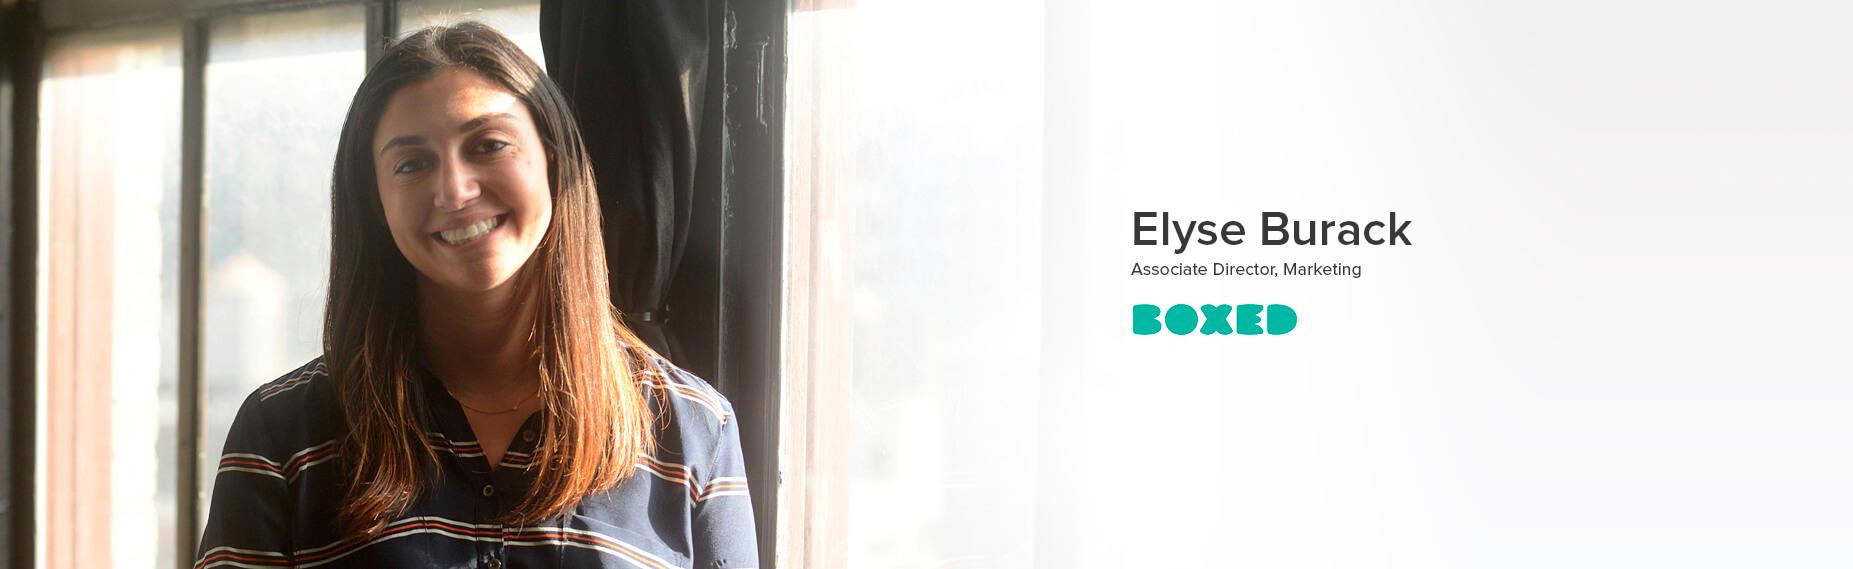 Elyse Burack, Associate Director of Marketing at Boxed